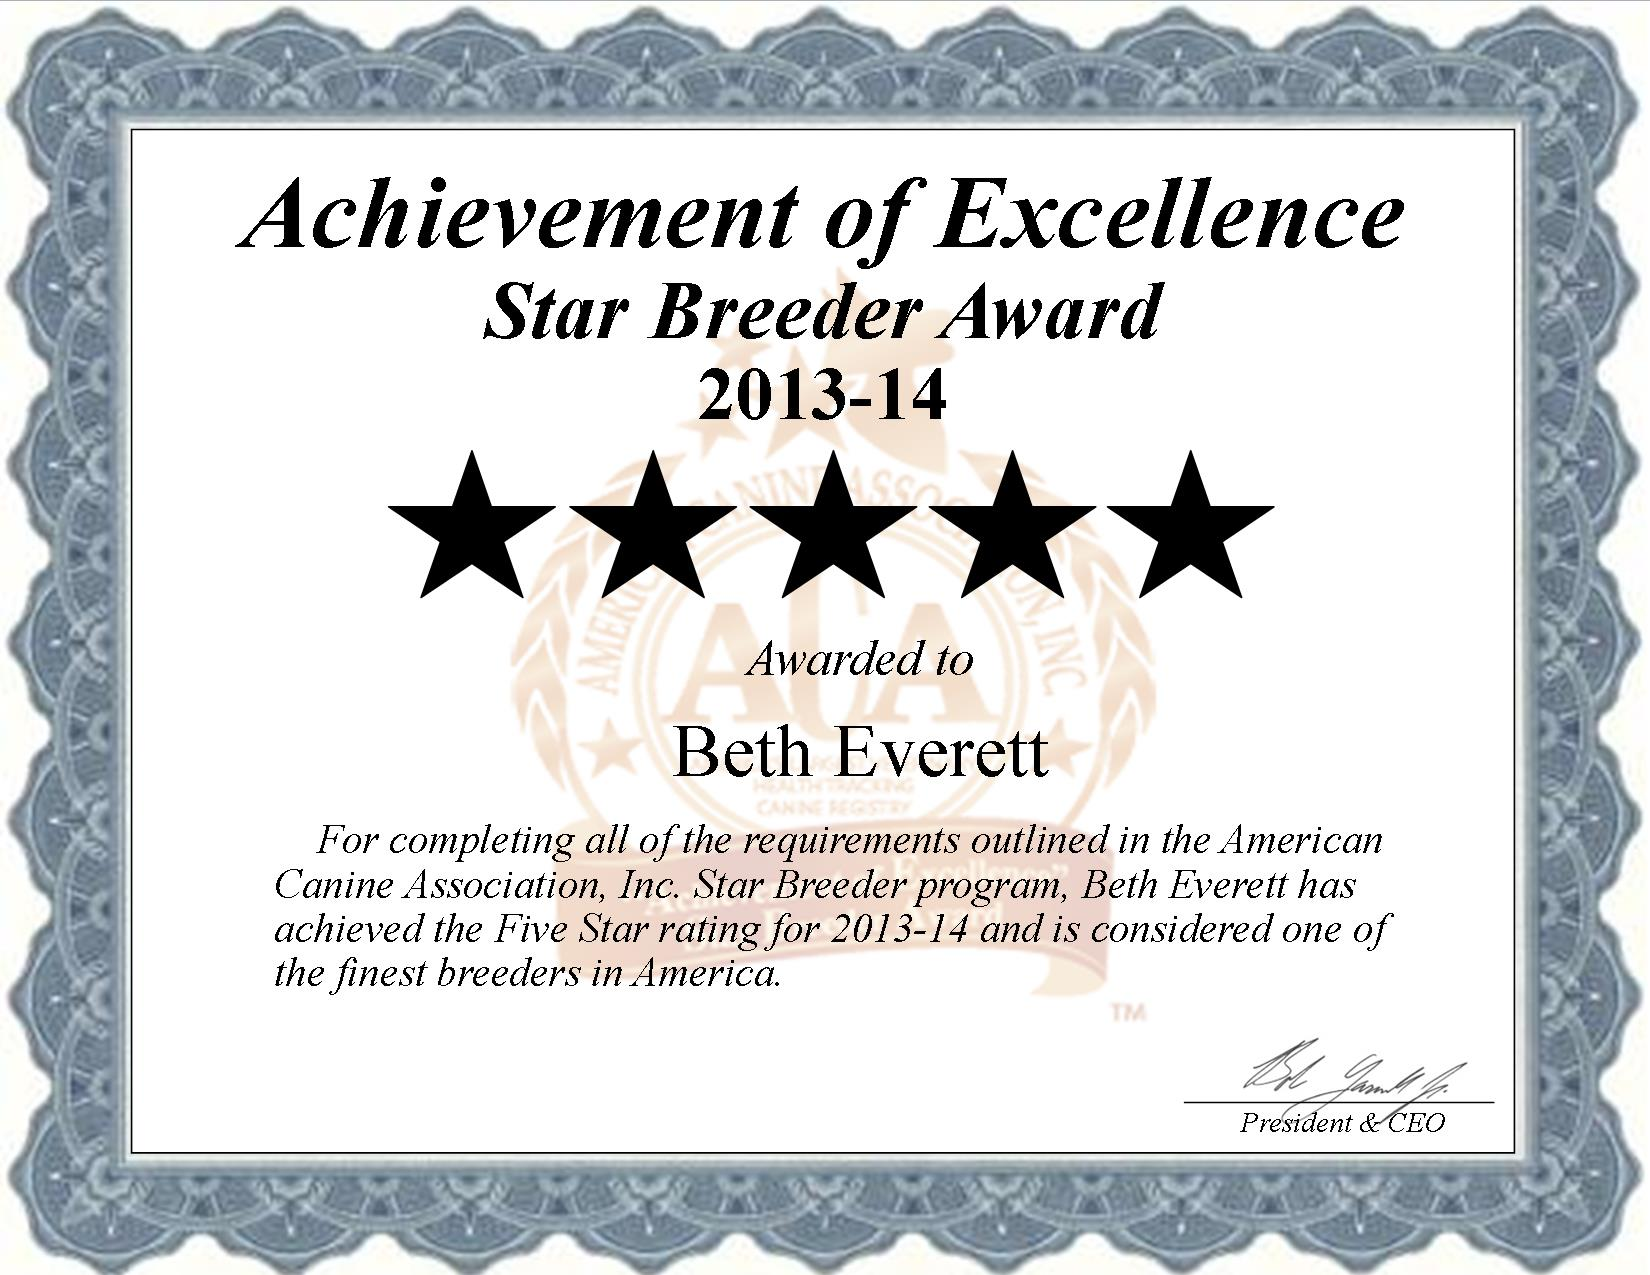 Beth Everett, Beth, Everett, Everett Kennel, moline, ks, kansas, breeder, star breeder, starbreeder, 5 star, dog, puppy, puppies, five star, kennel